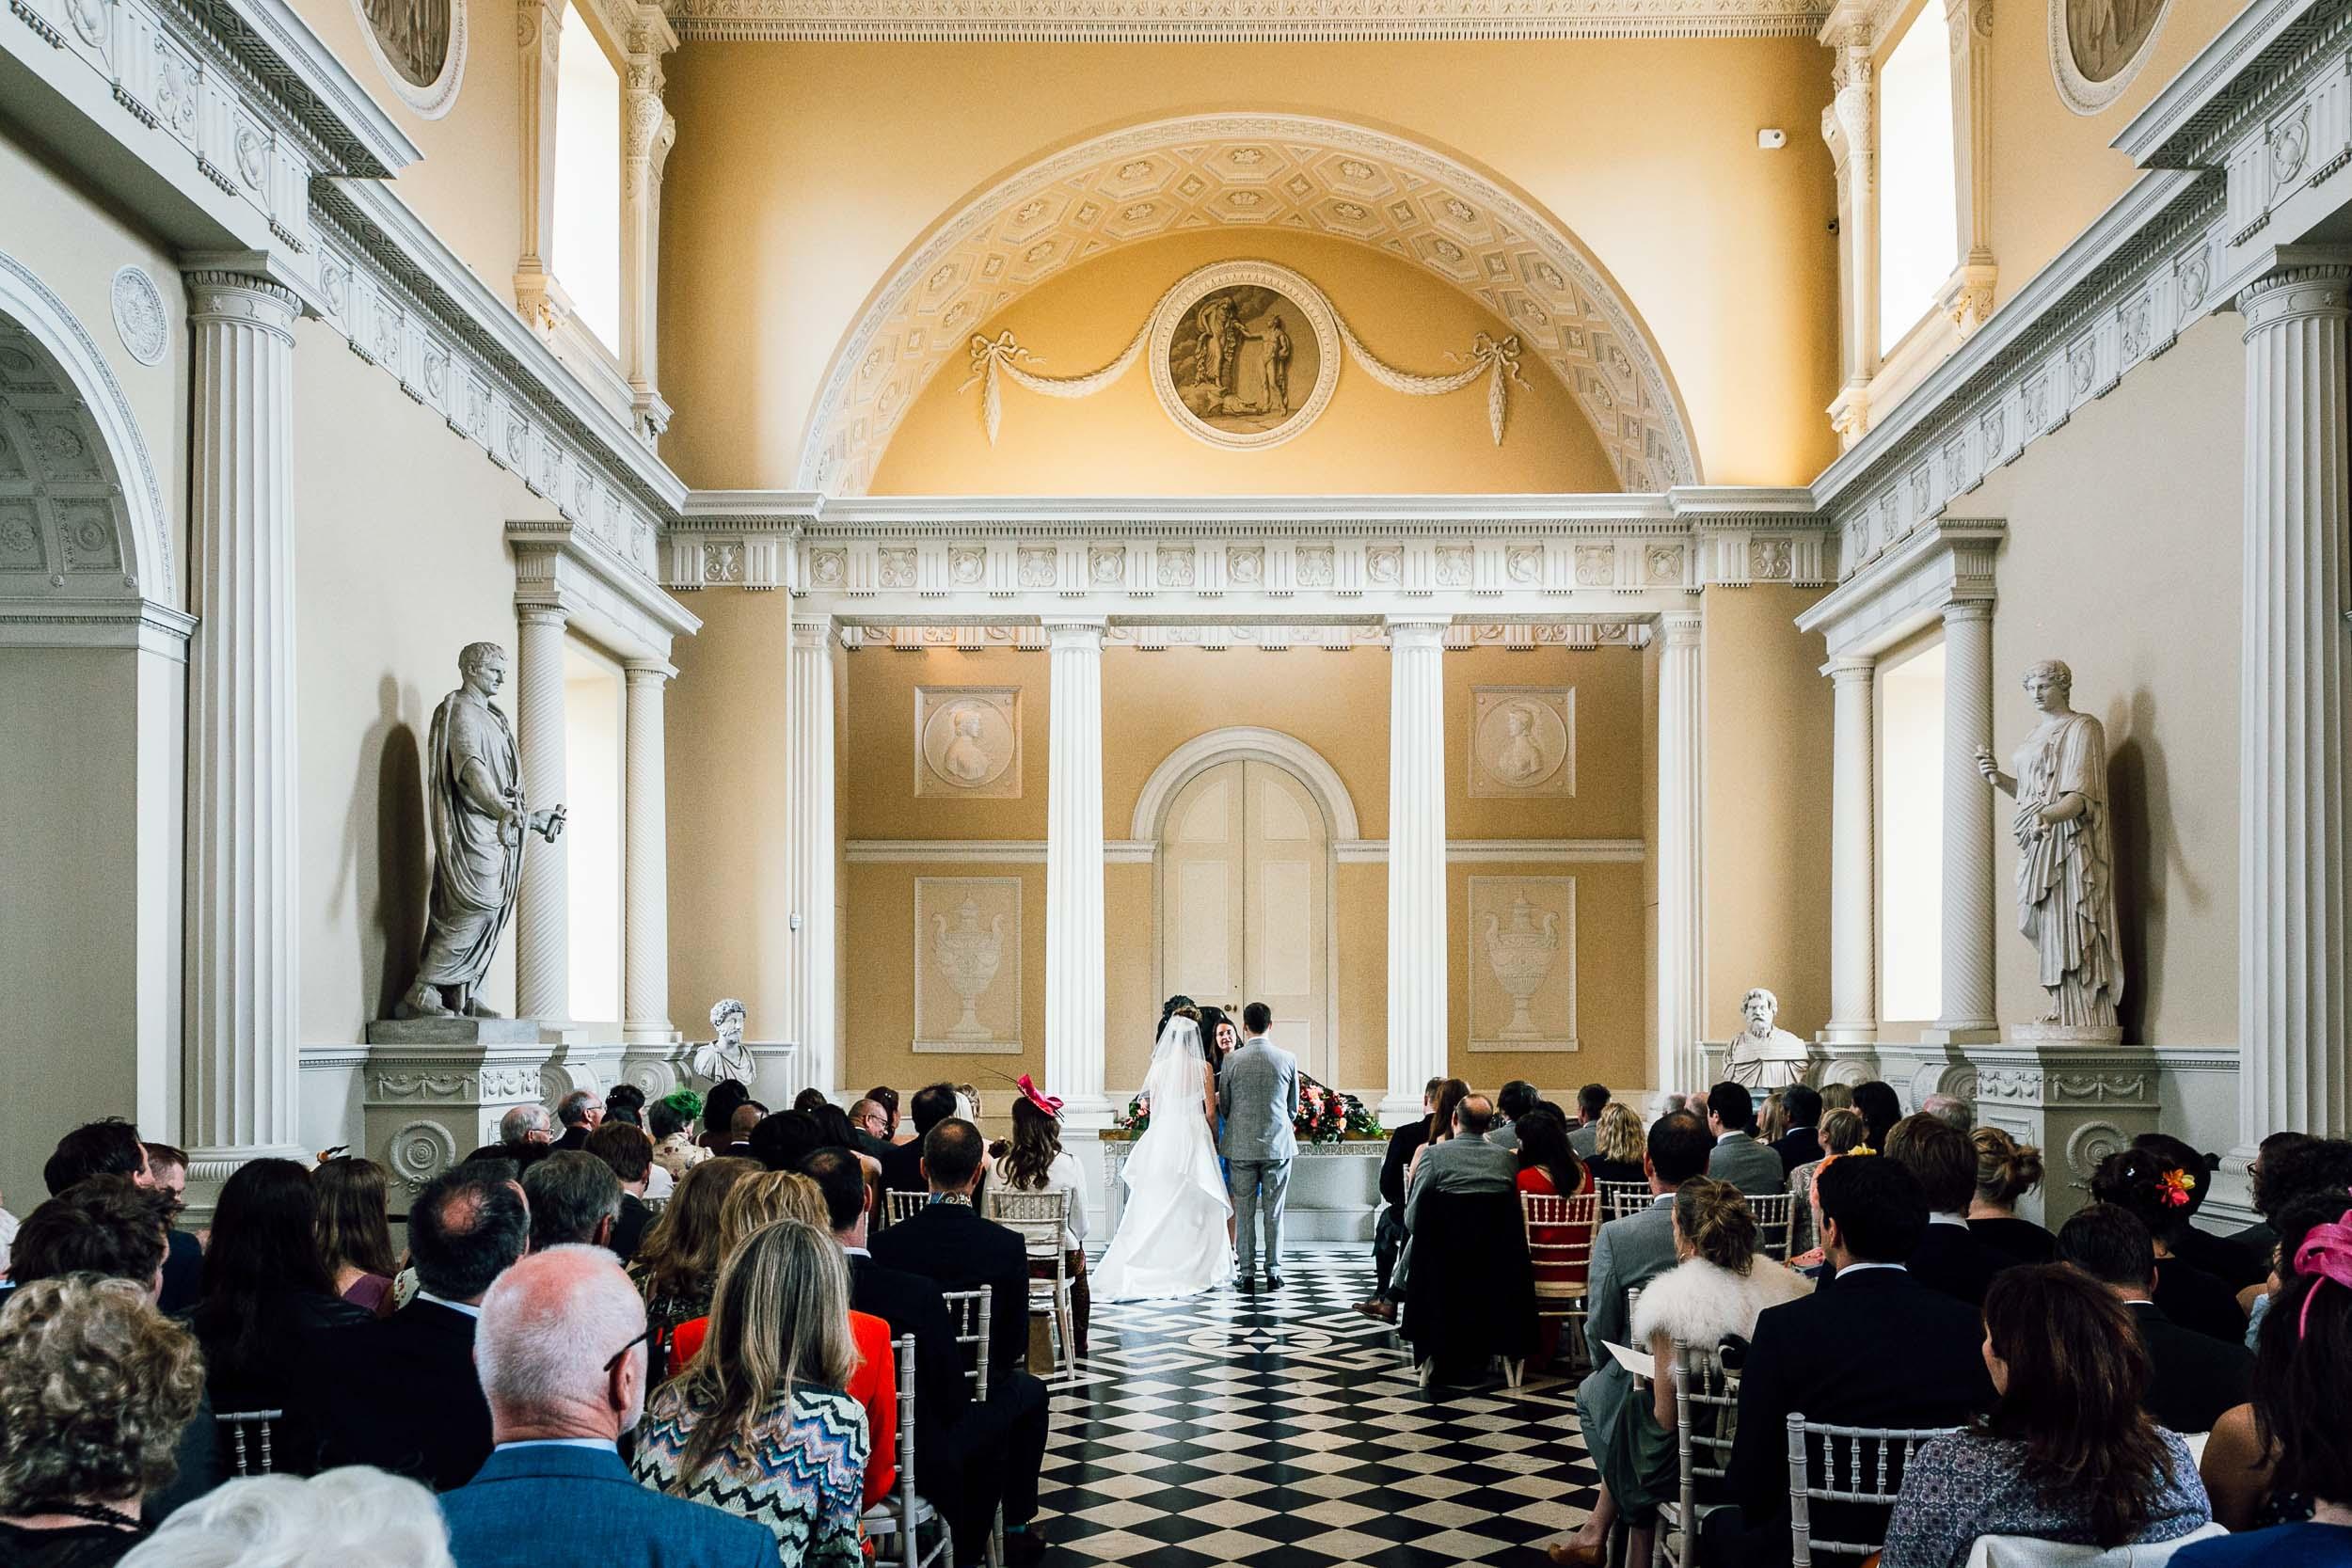 syon-house-wedding-photographer-london 057.jpg